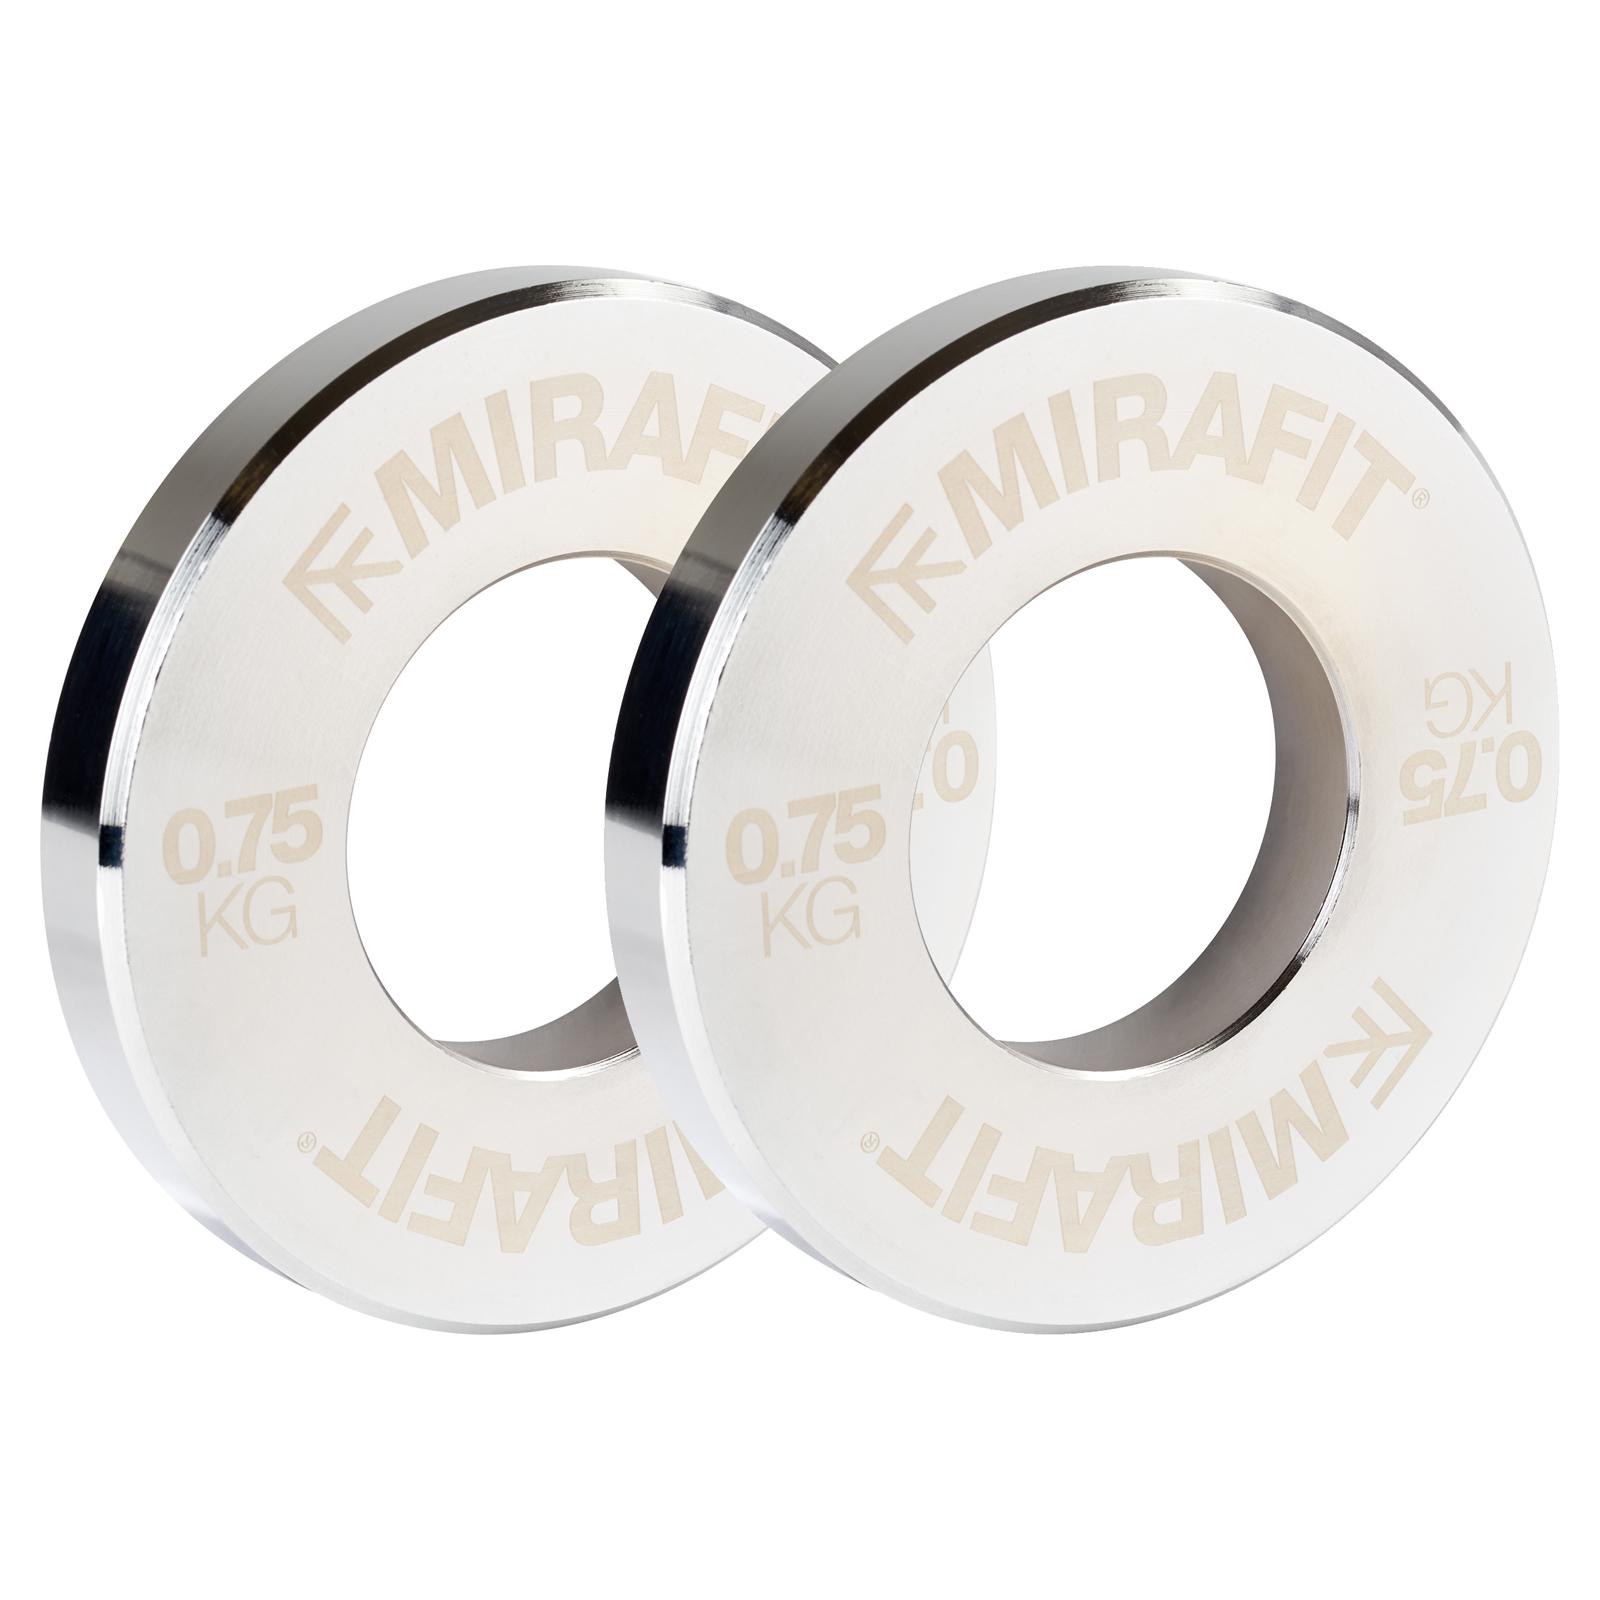 Set of Olympic Fractional Steel Weights //Plates includes 1kg 0.75kg 0.5kg 0.25kg